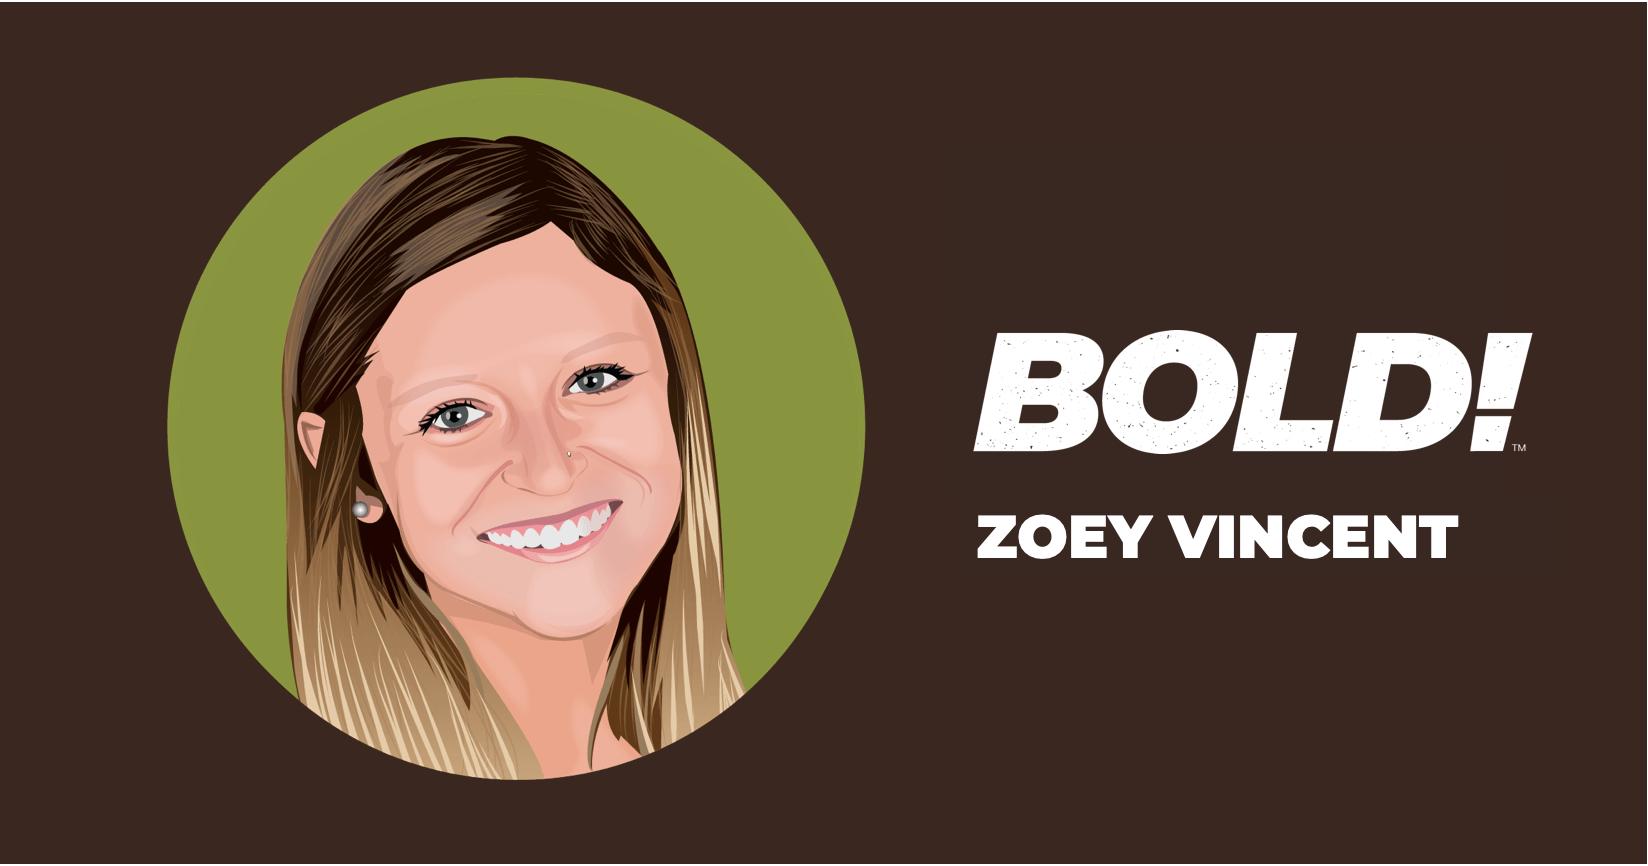 Bold-Zoey-Vincent